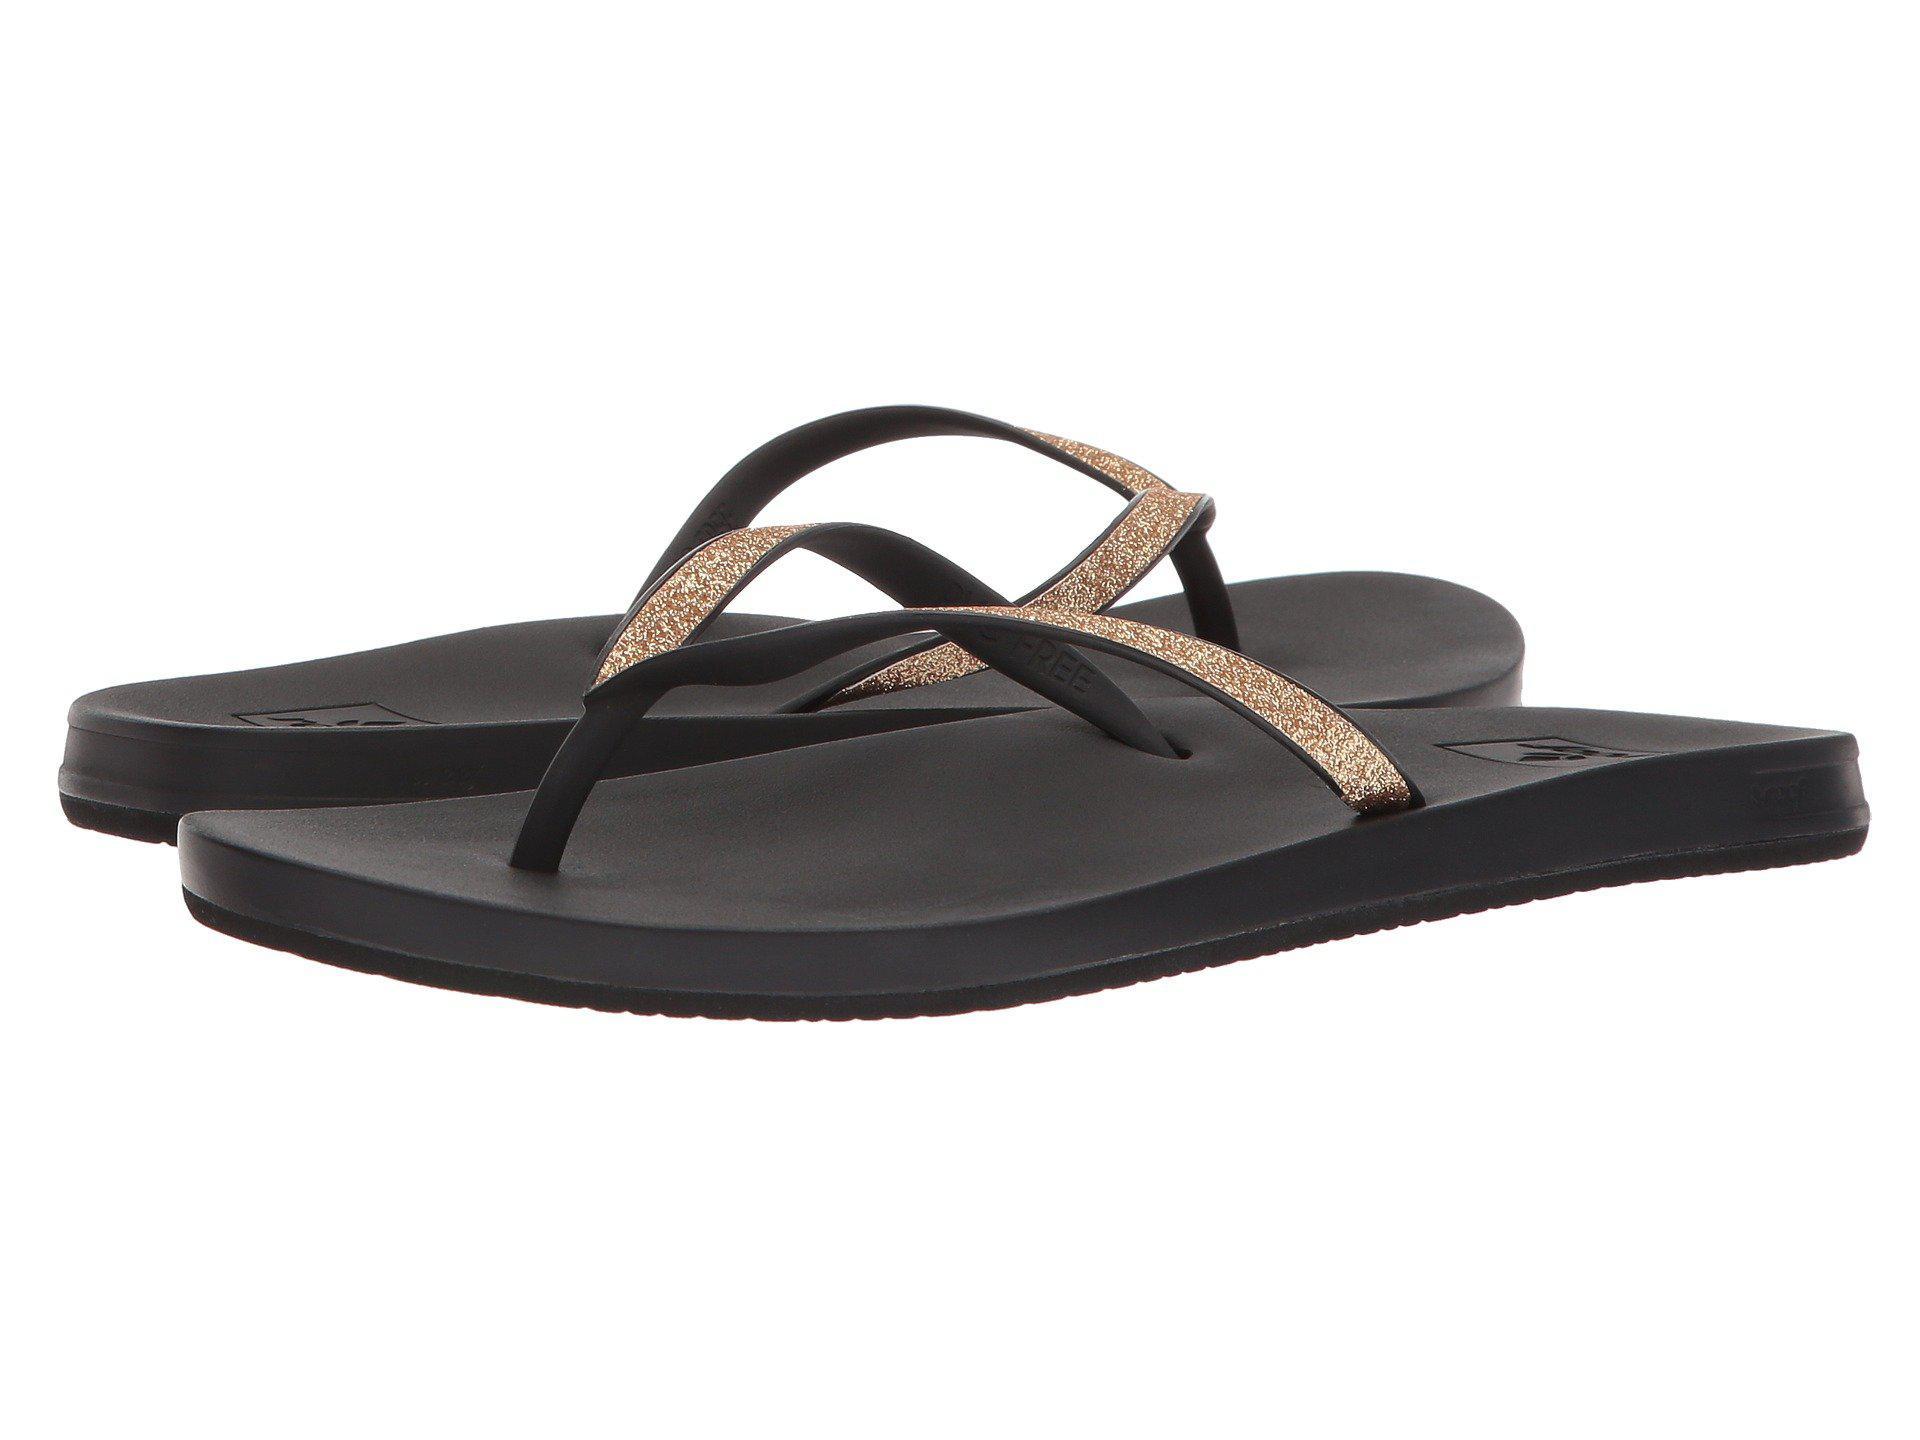 0c14472bd23c Lyst - Reef Cushion Bounce Stargazer (frappe) Women s Sandals in ...